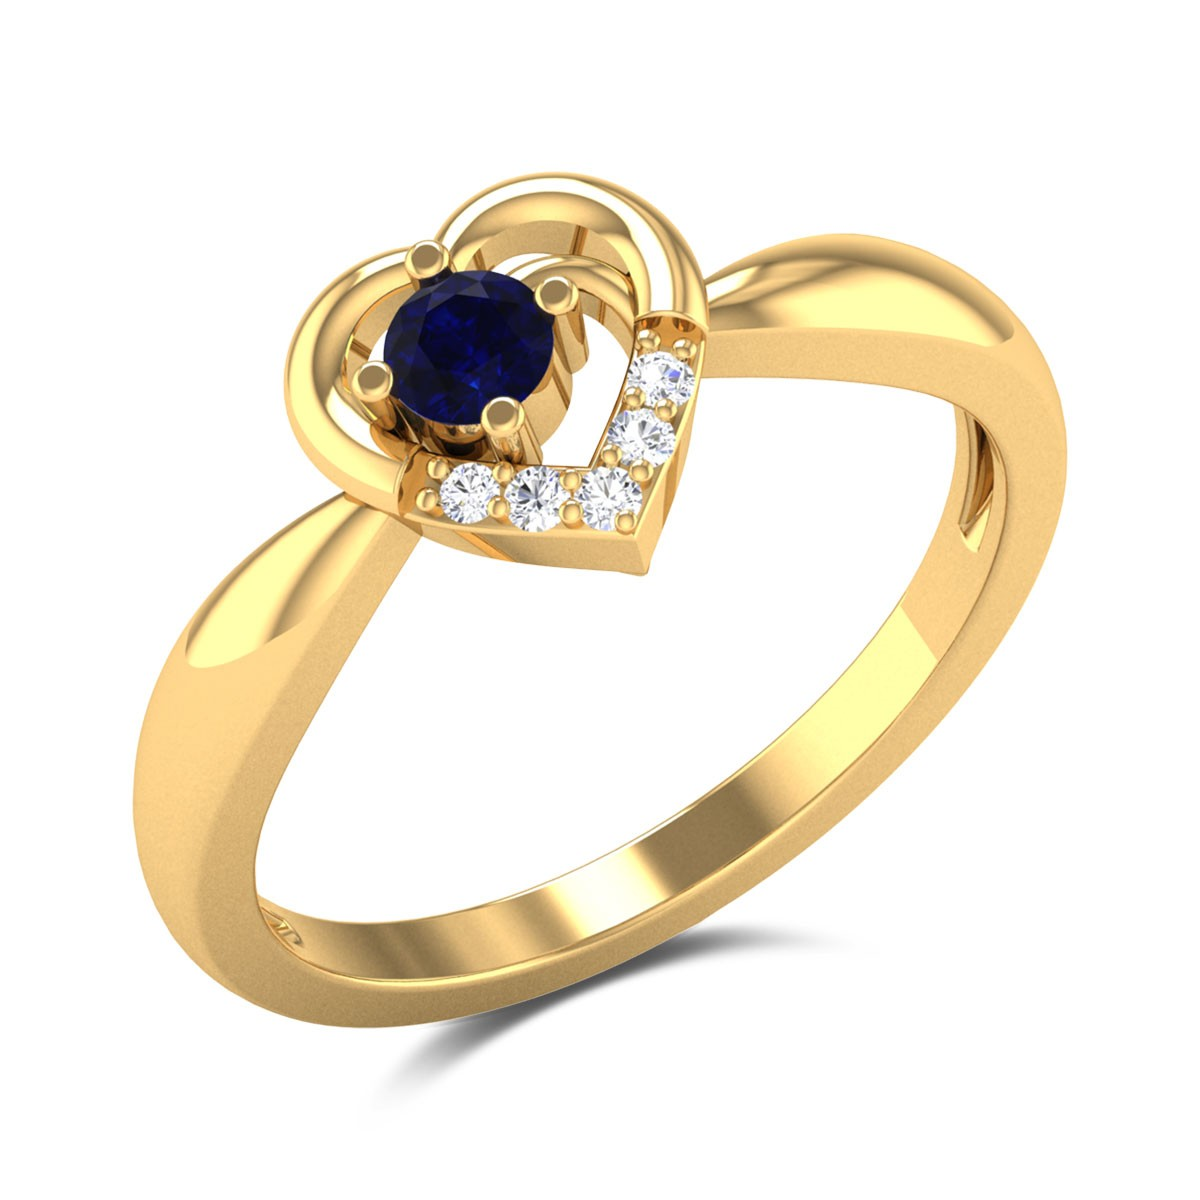 Romantic Heart Diamond Ring